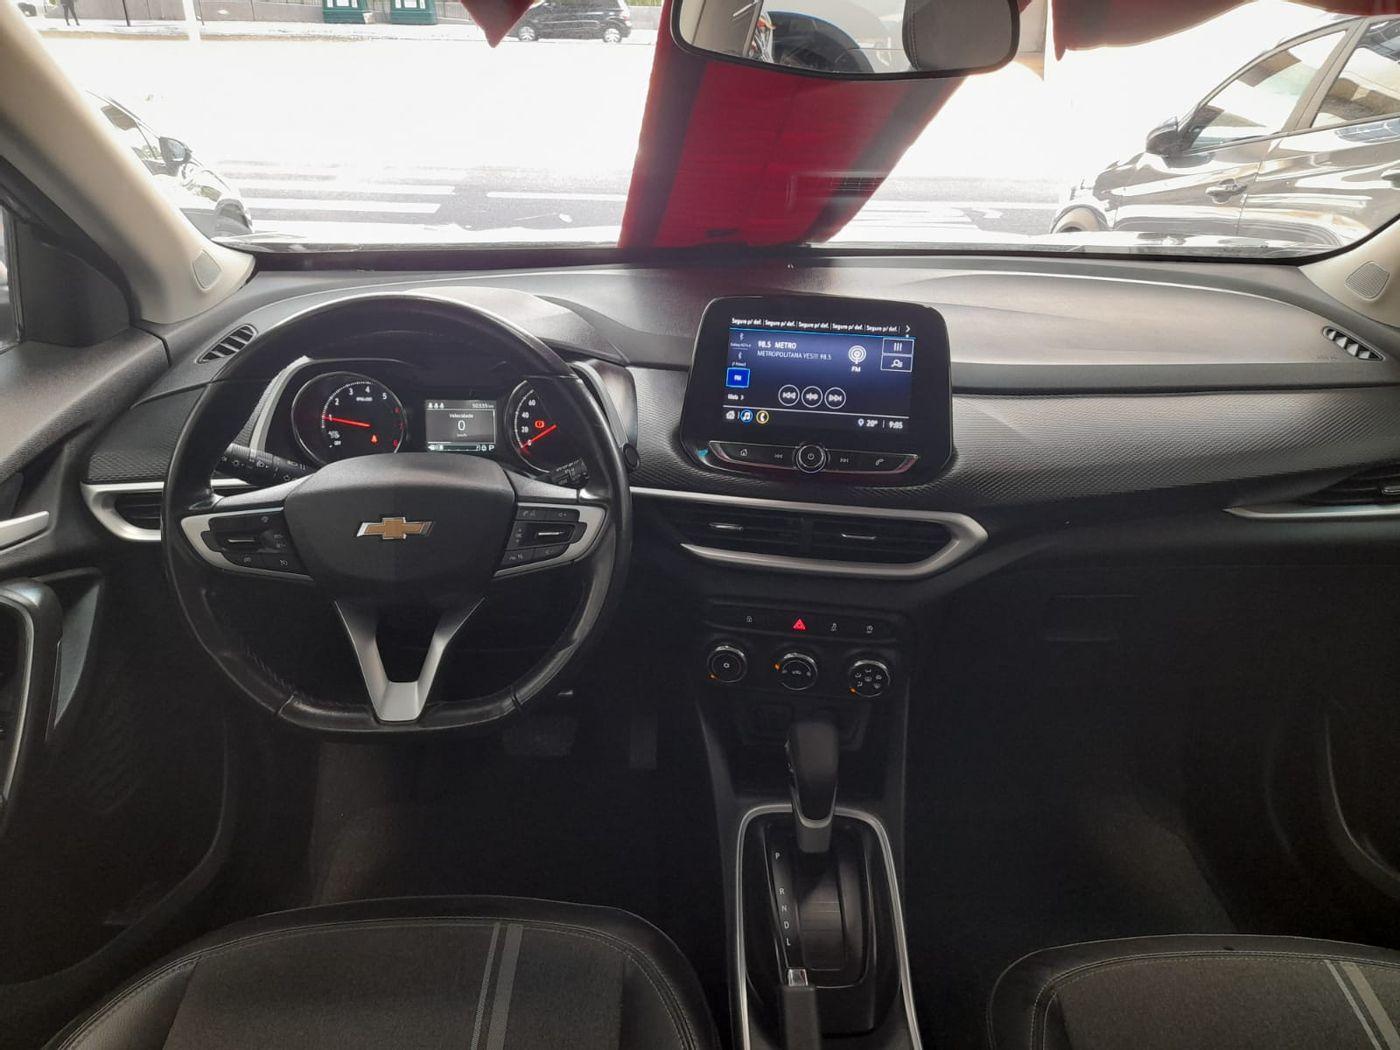 Chevrolet TRACKER LTZ 1.2 Turbo 12V Flex Aut.